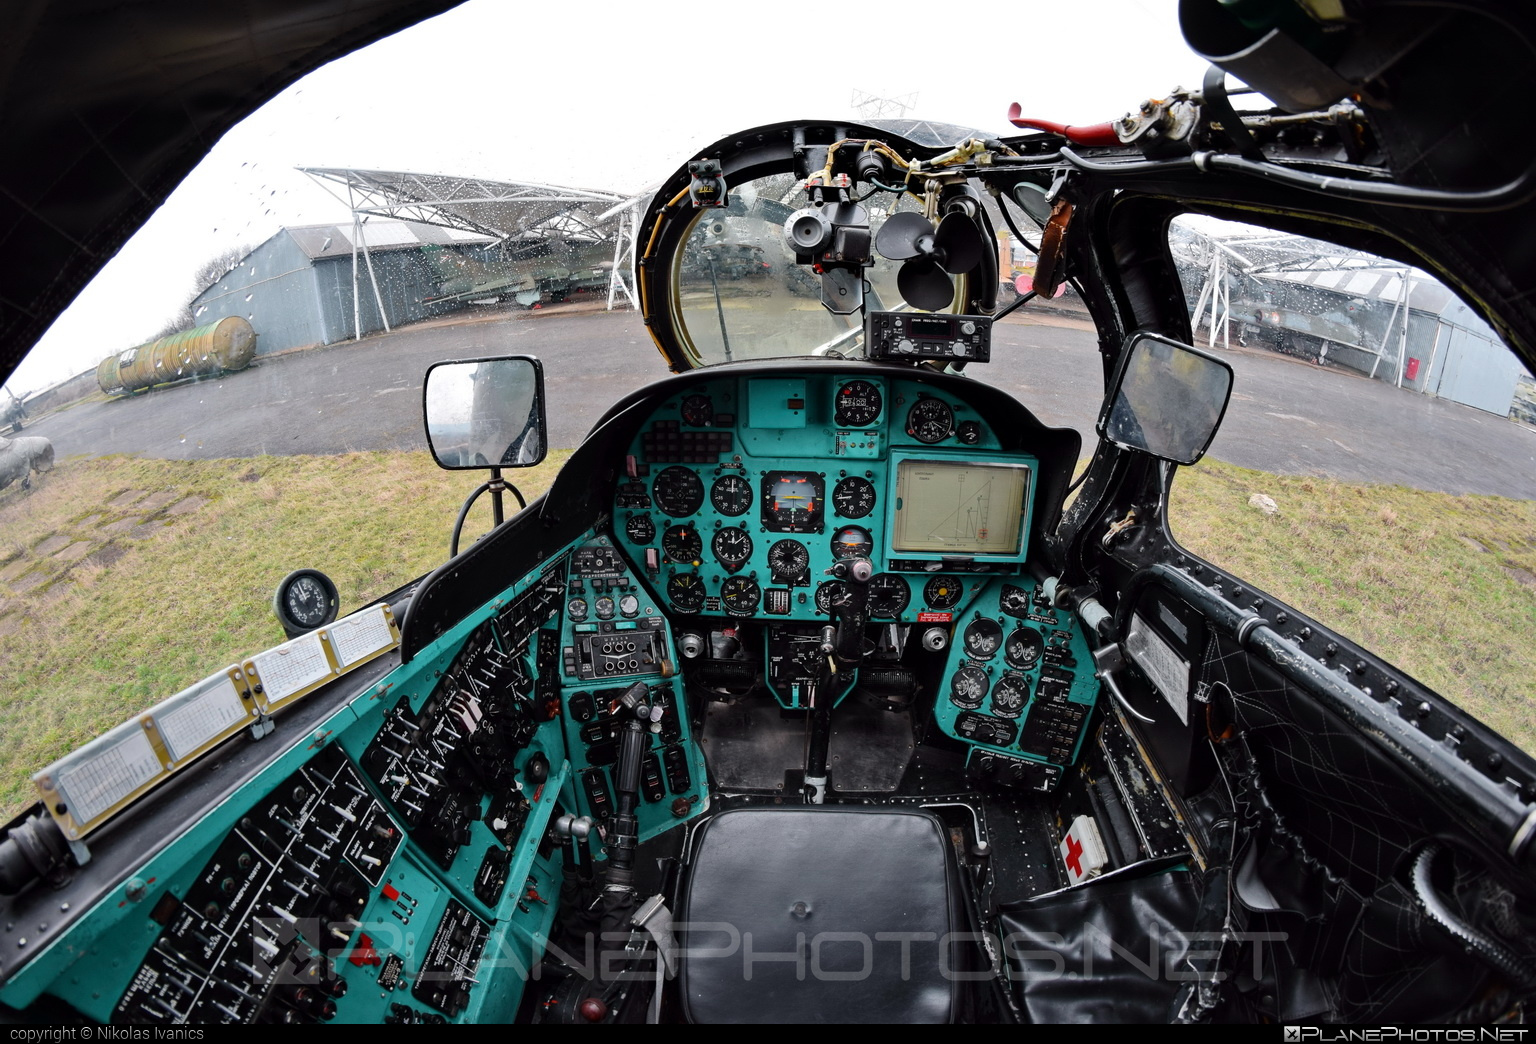 Mil Mi-24D - 0149 operated by Vzdušné sily OS SR (Slovak Air Force) #mi24 #mi24d #mil #mil24 #mil24d #milhelicopters #slovakairforce #vzdusnesilyossr